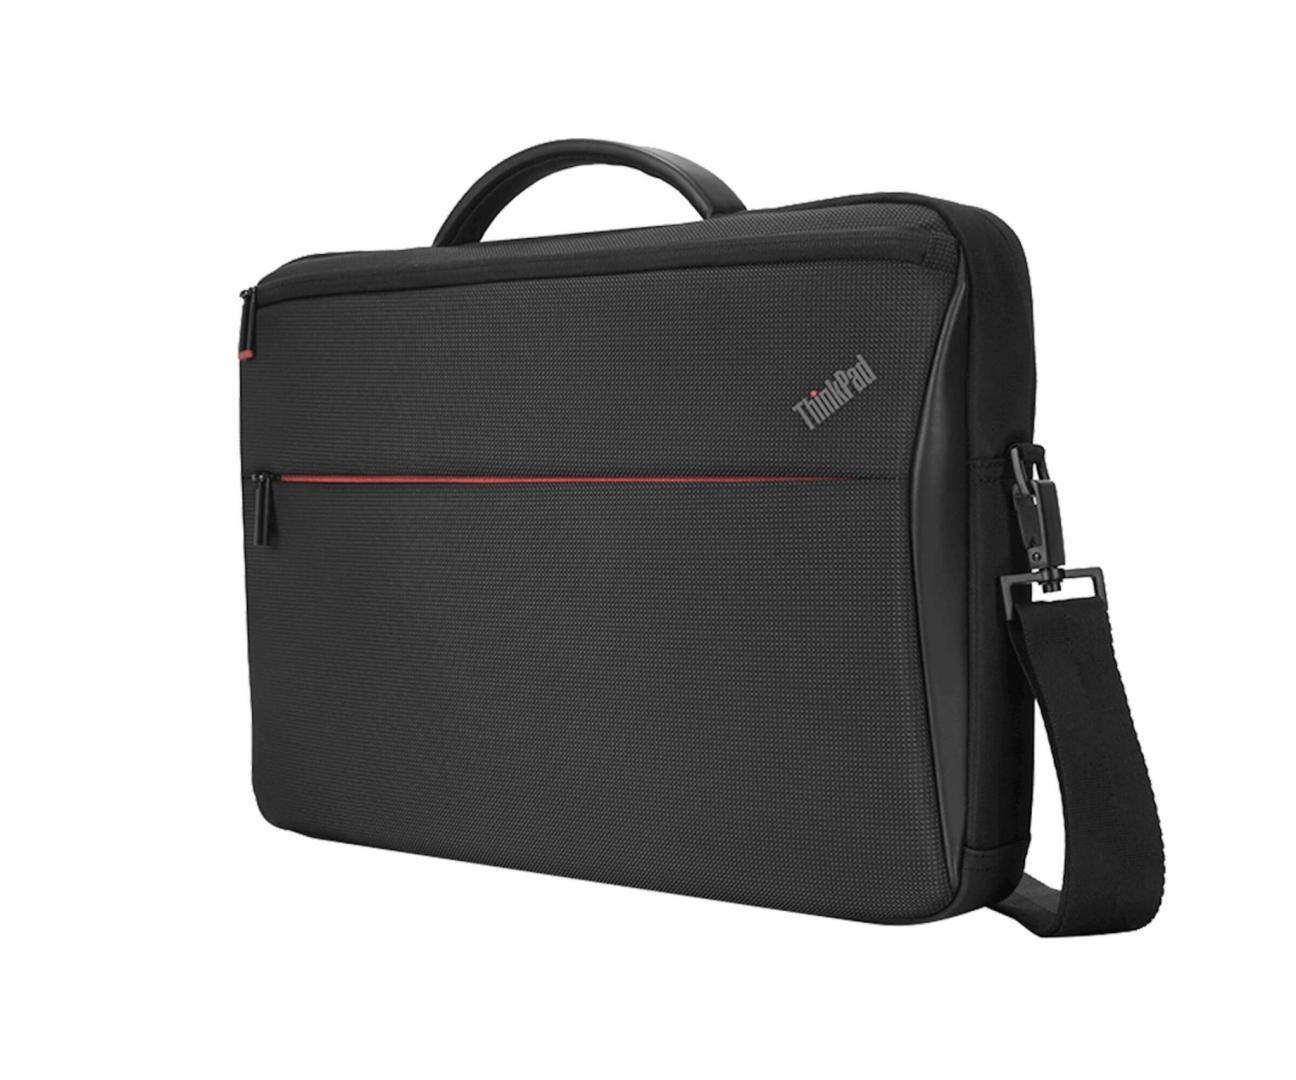 Geanta Lenovo ThinkPad 14 Professional Slim Topload, 33.6 x 23.5 x 2.7 cm, black - imaginea 2